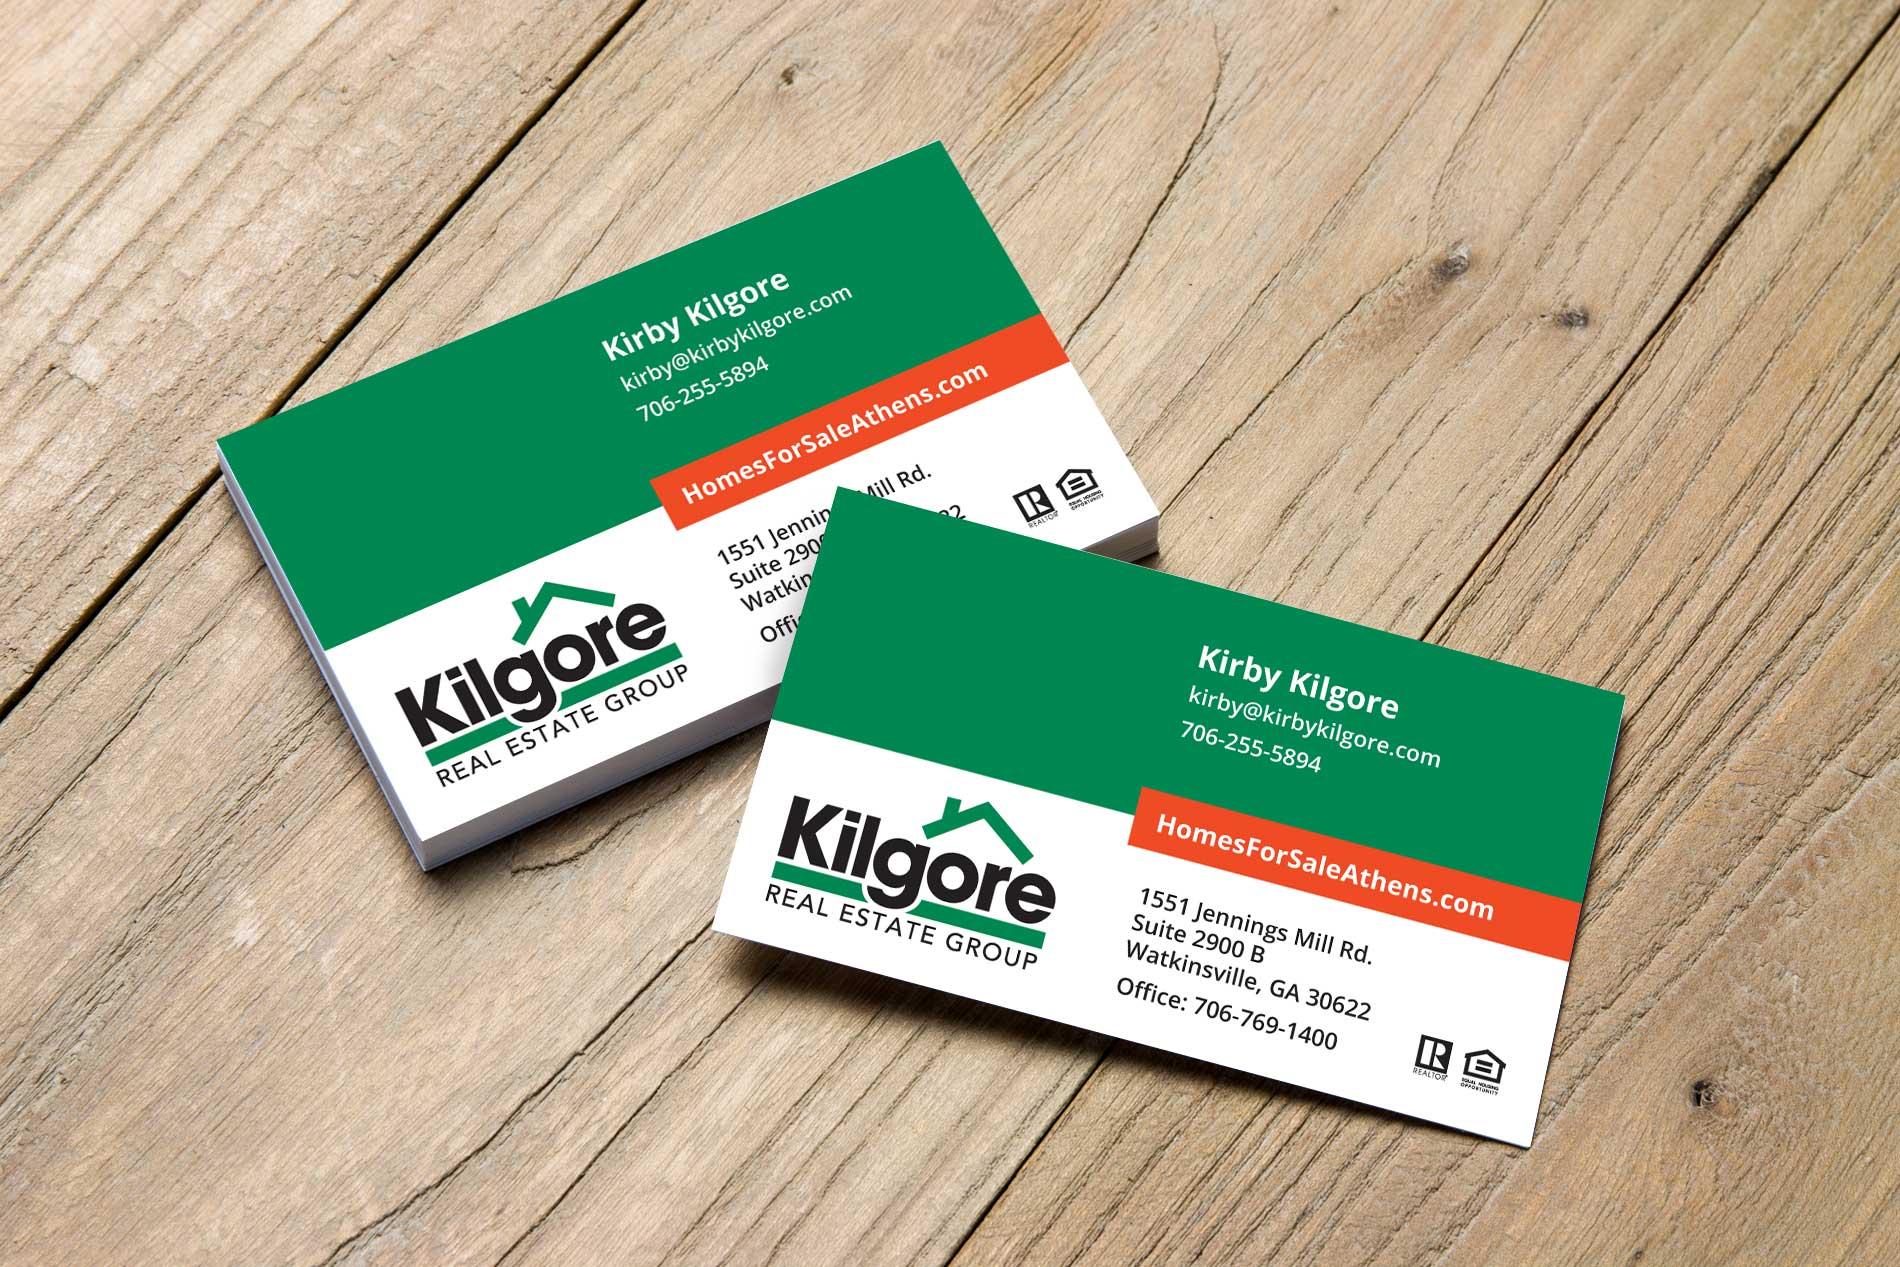 Kilgore Real Estate Group Business Cards – ryanlitts creative